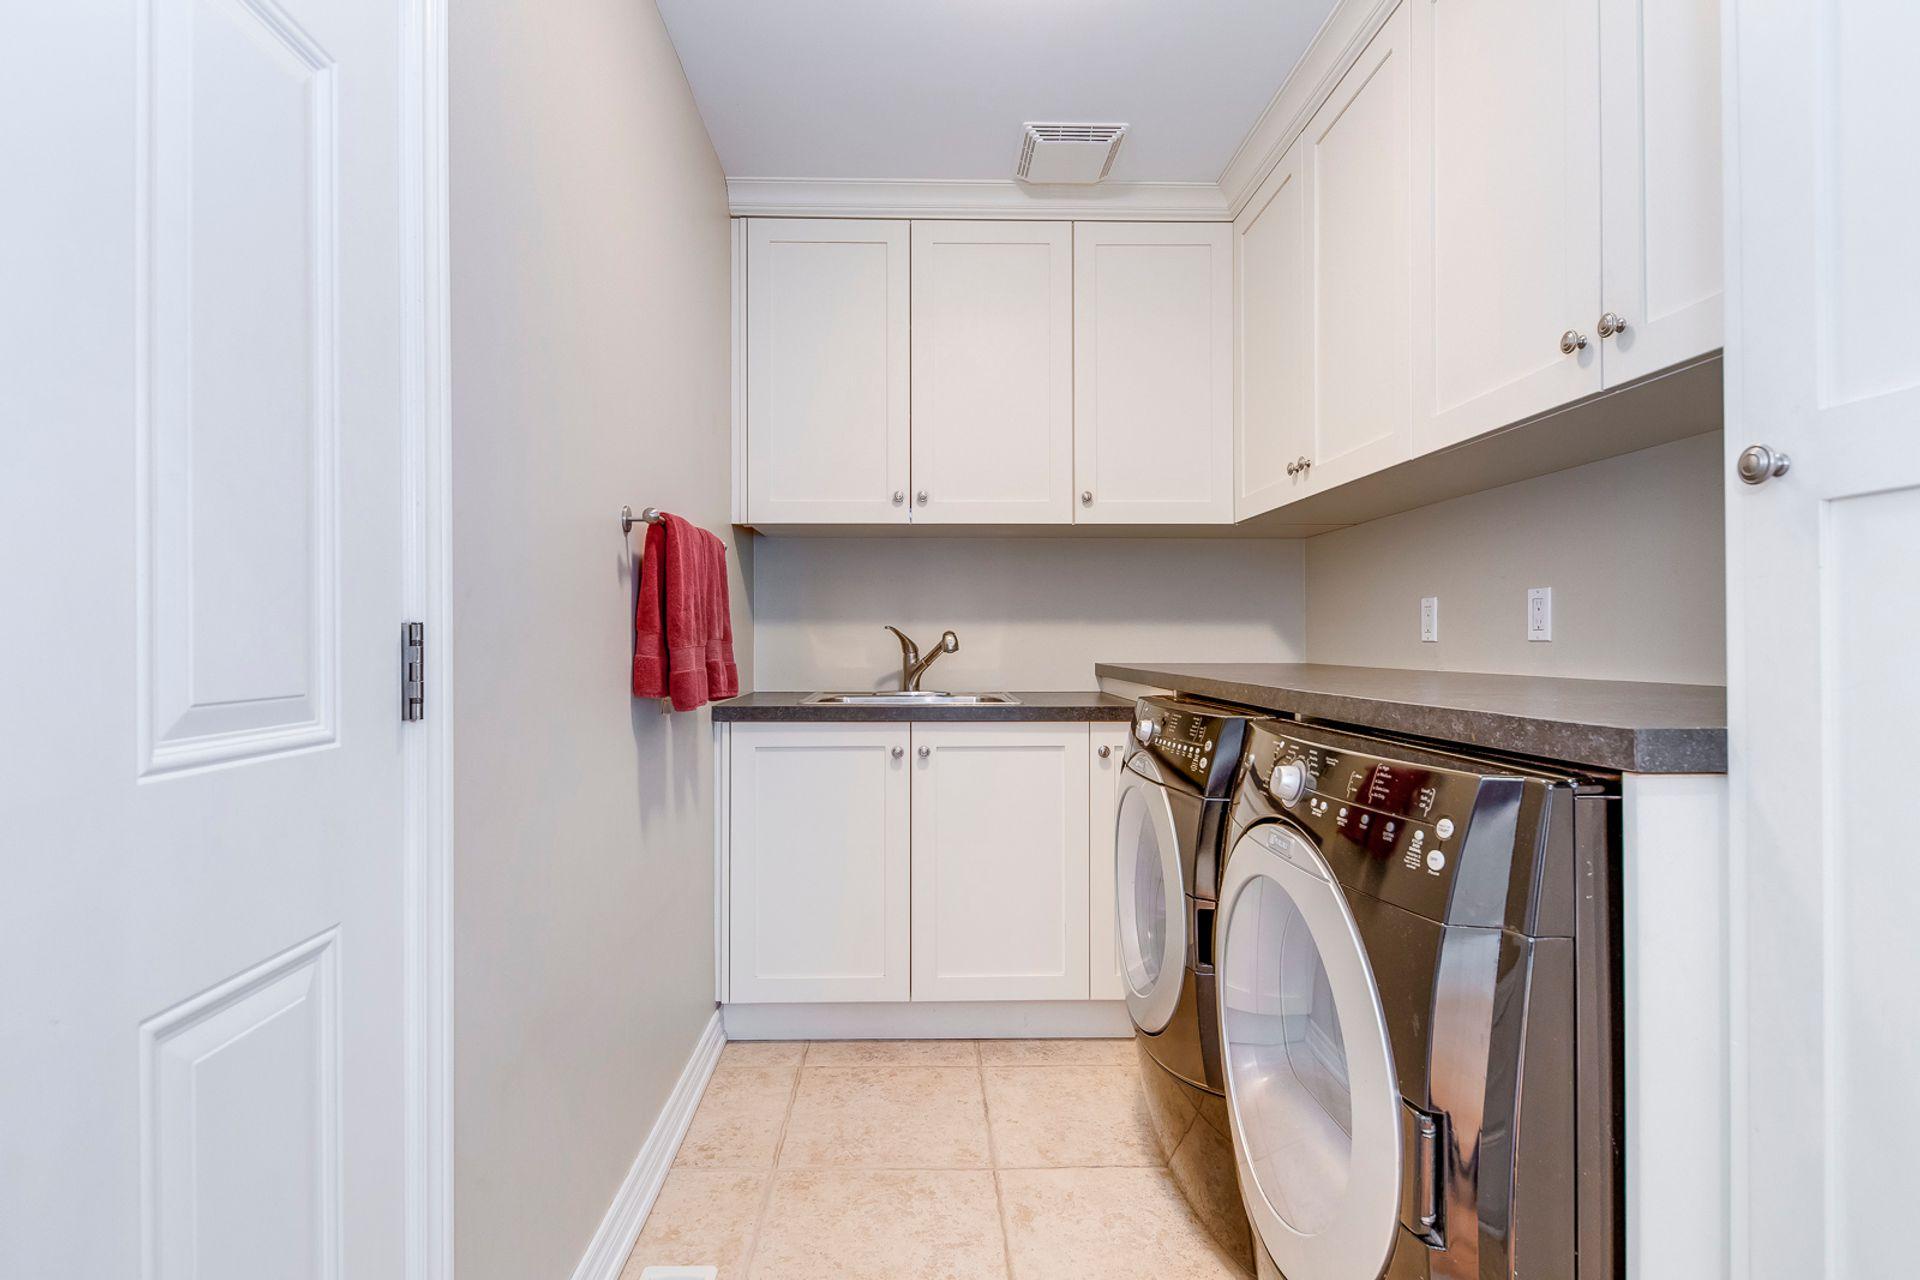 Laundry Room - 2465 North Ridge Tr, Oakville - Elite3 & Team at 2465 North Ridge Trail, Iroquois Ridge North, Oakville